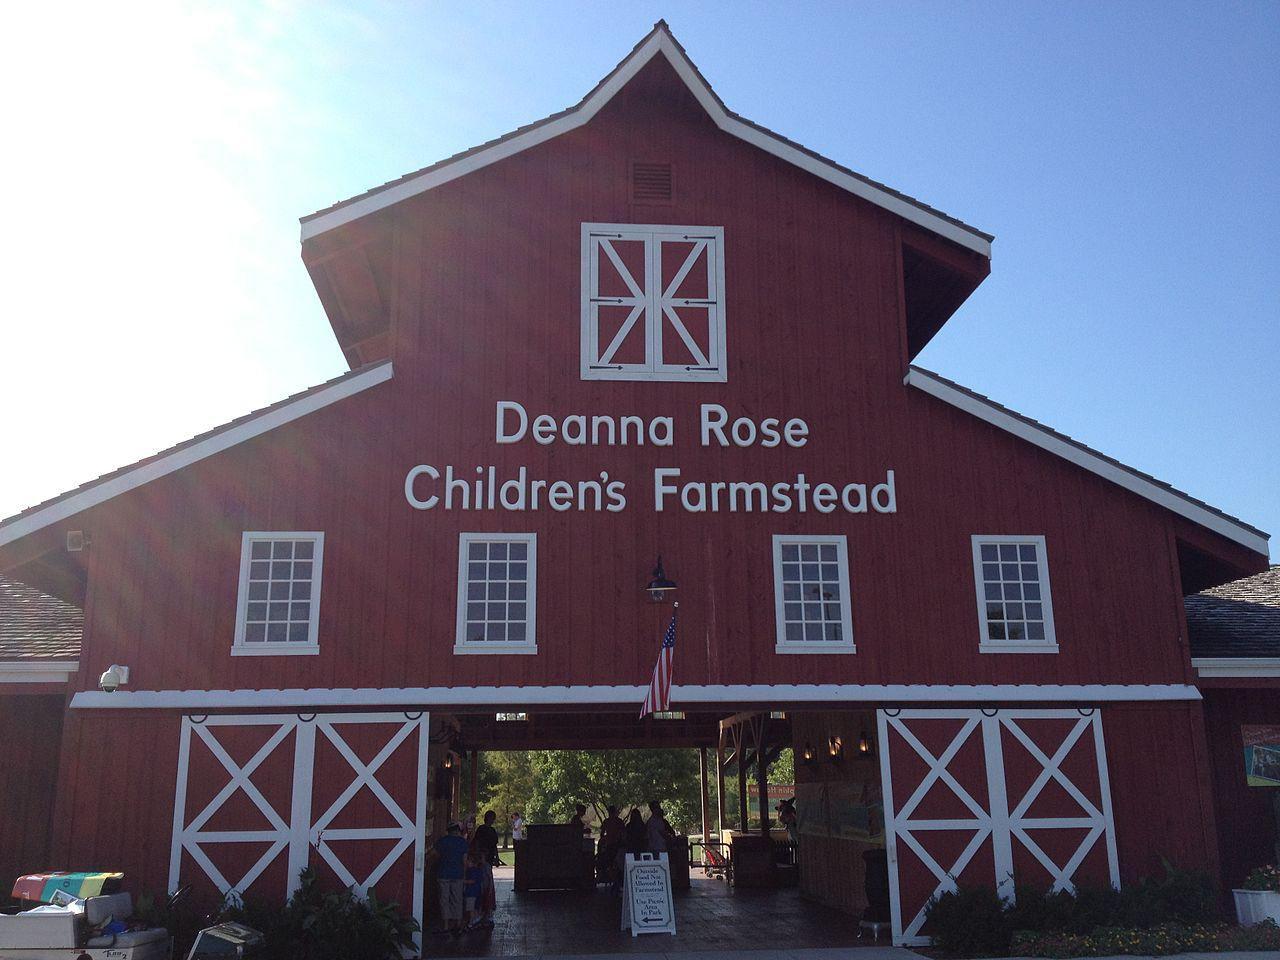 Entrance to Deanna Rose Children's Farmstead in Overland Park, Kansas